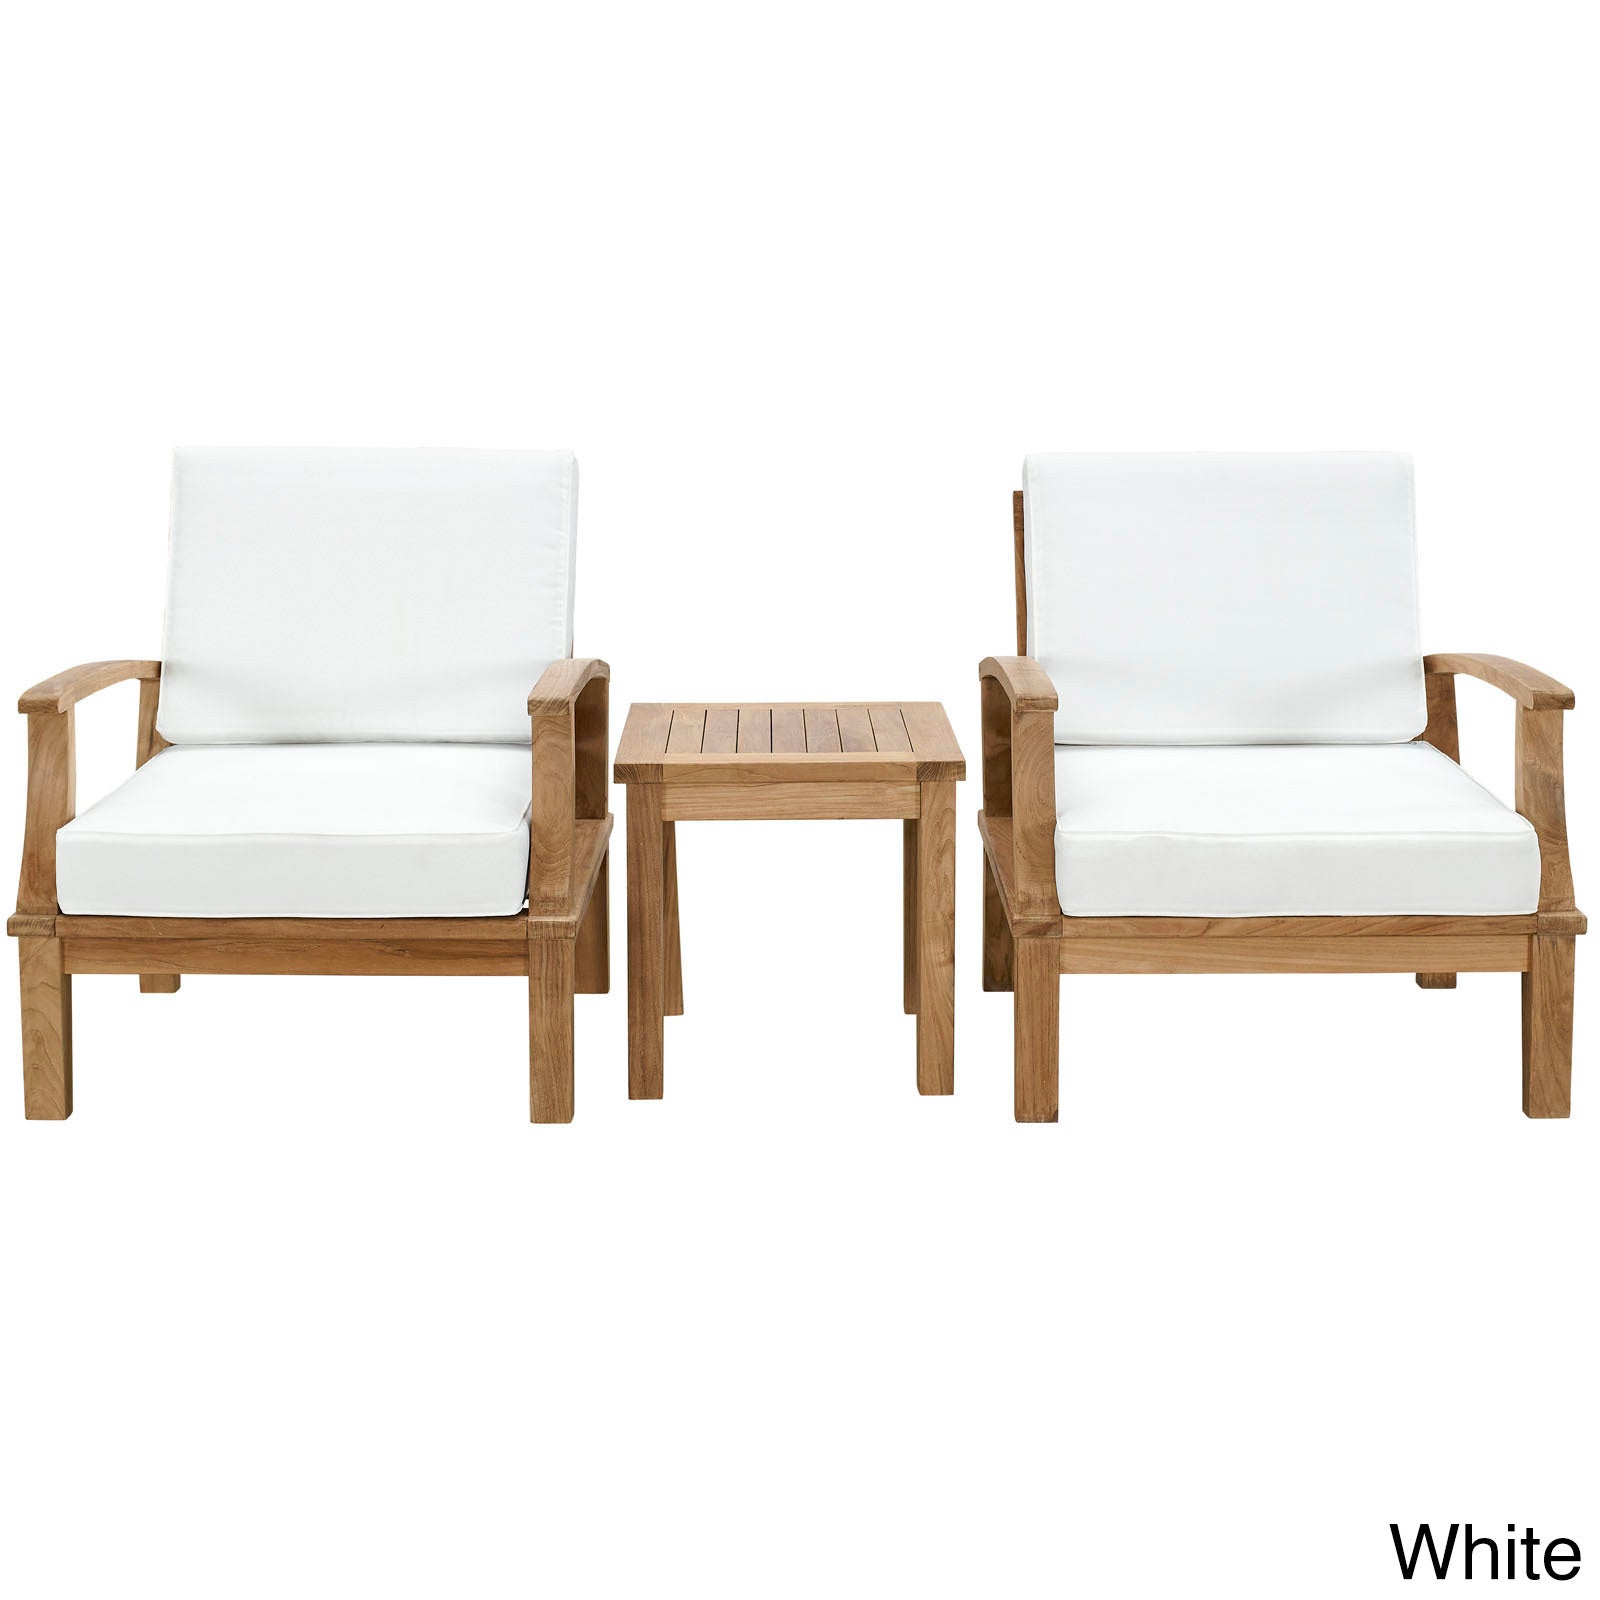 Pier 3 Piece Outdoor Patio Teak Sofa Set